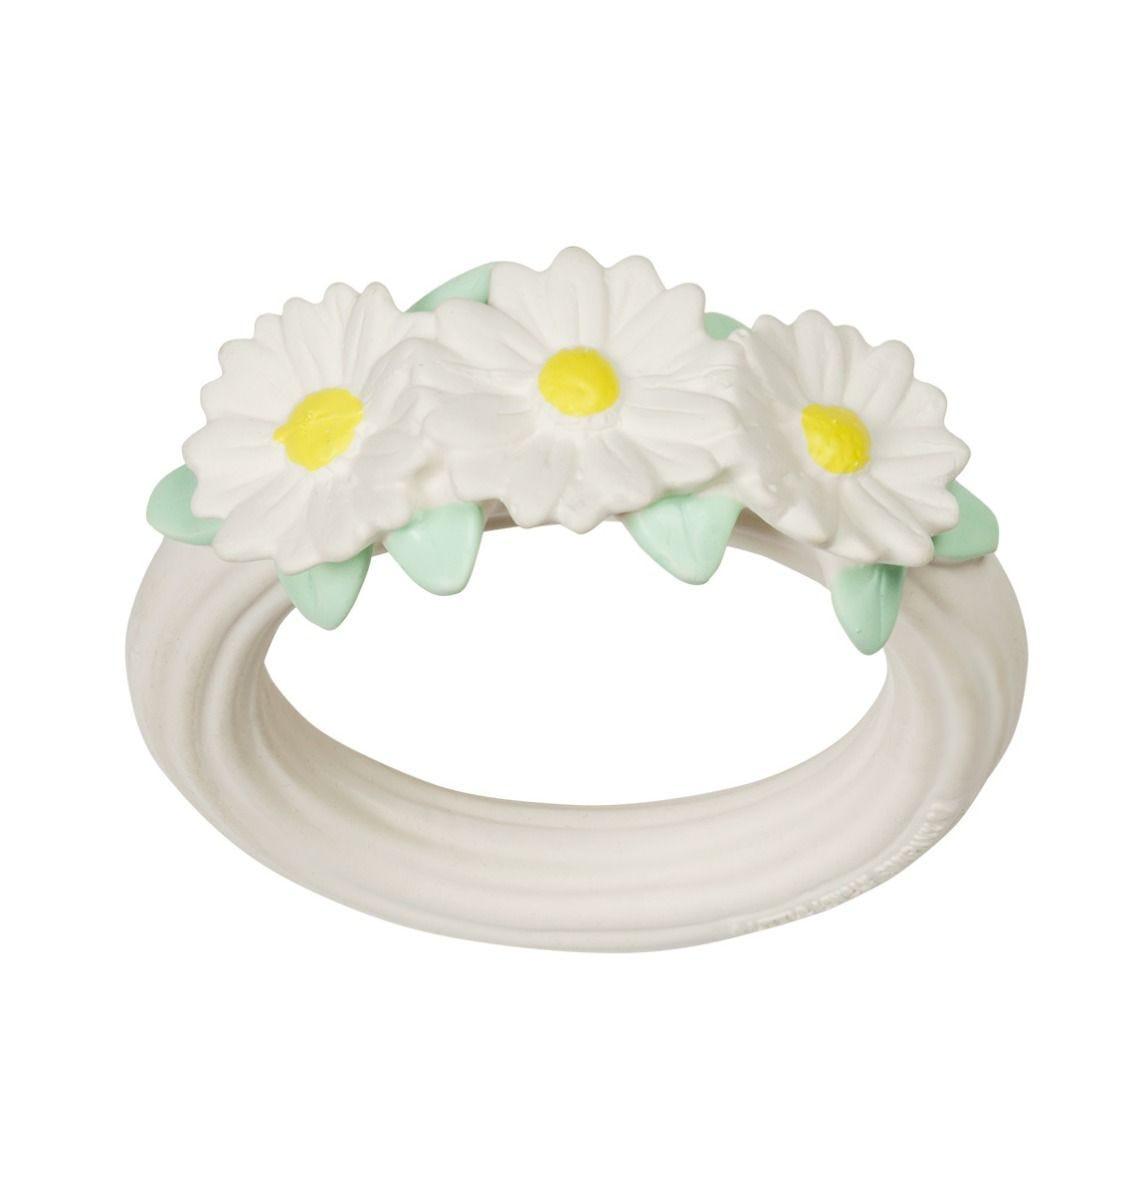 trdcwh09-lr-8-teething-ring-daisy-chain